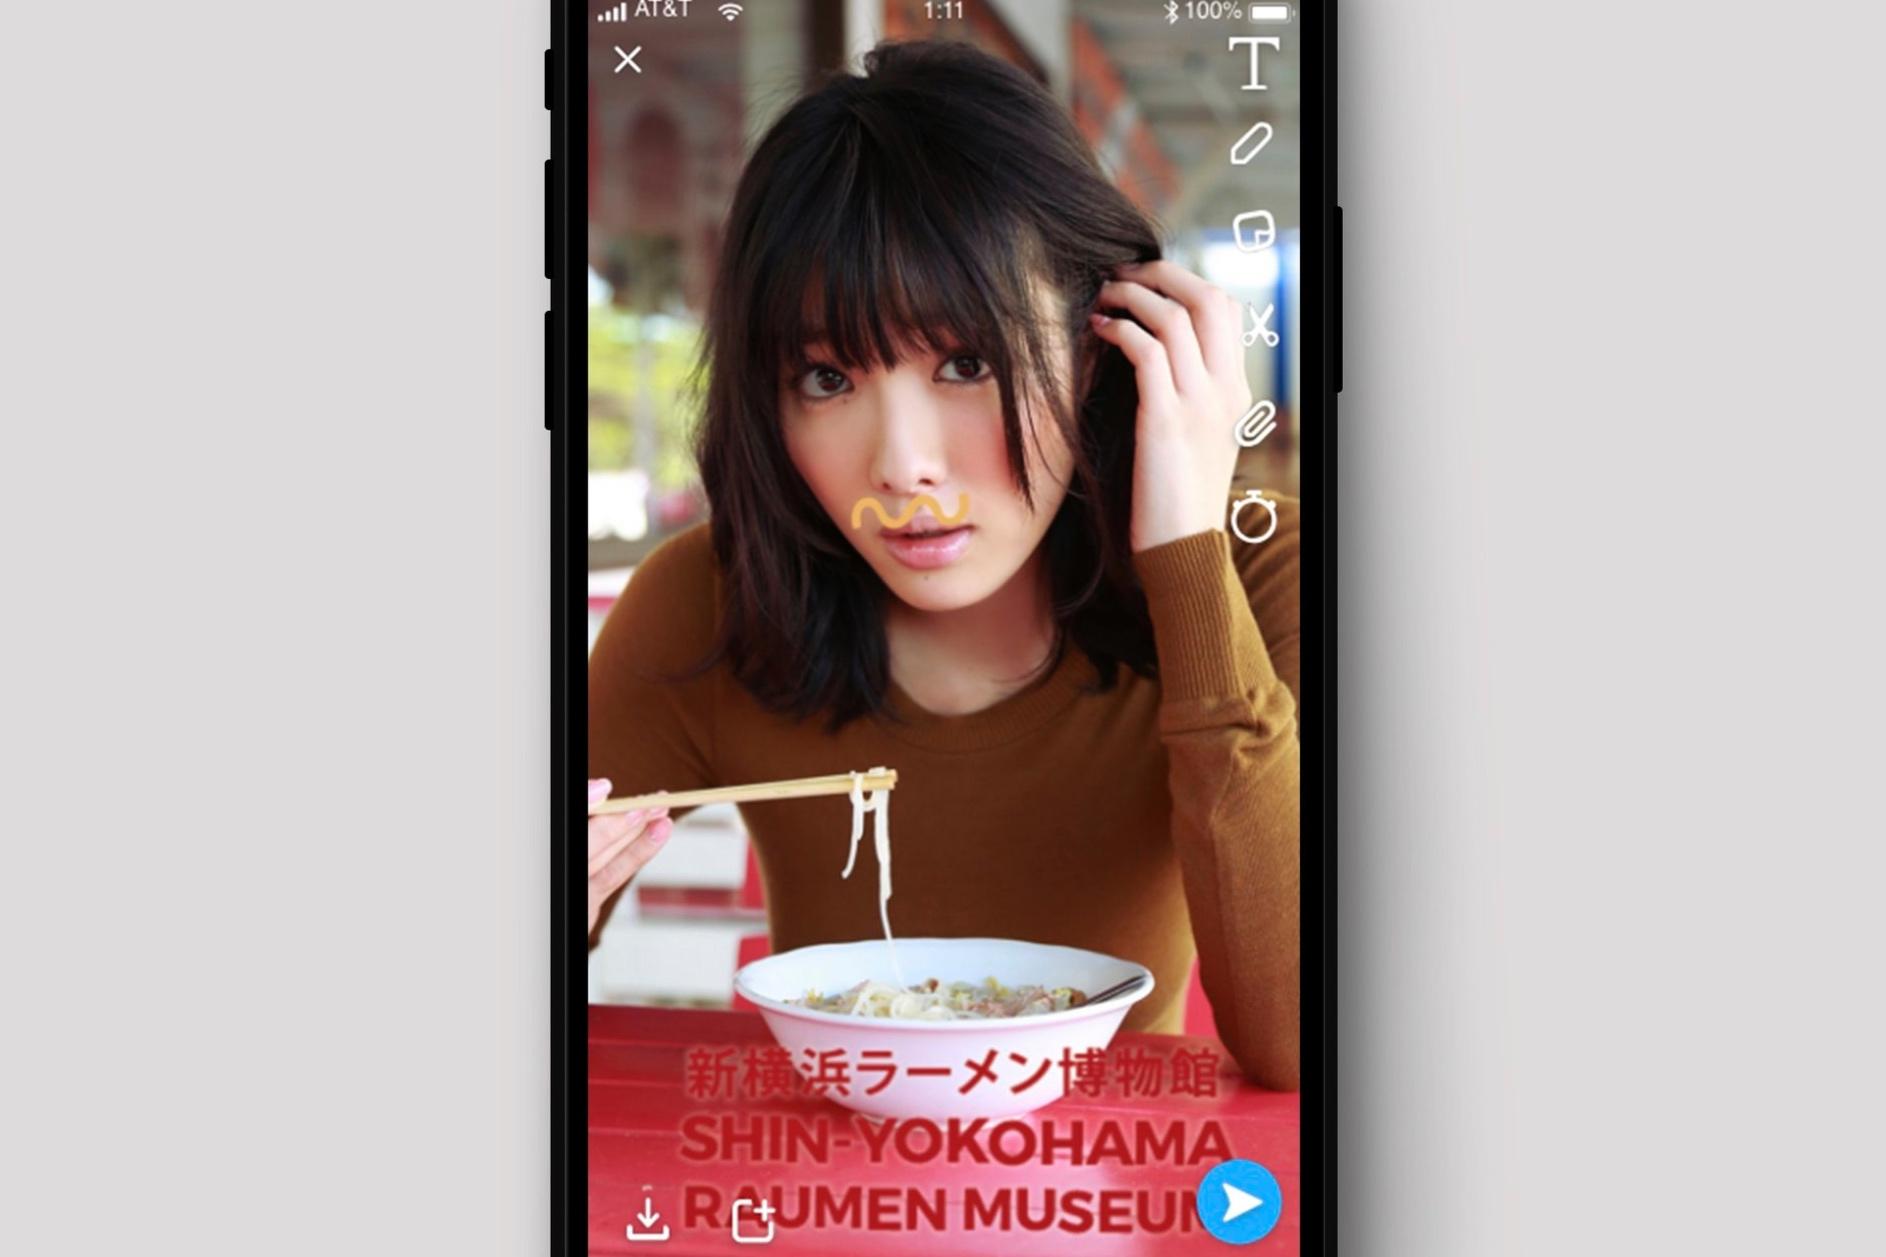 Snapchat Lens for Shin-Yokohama Raumen Museum -